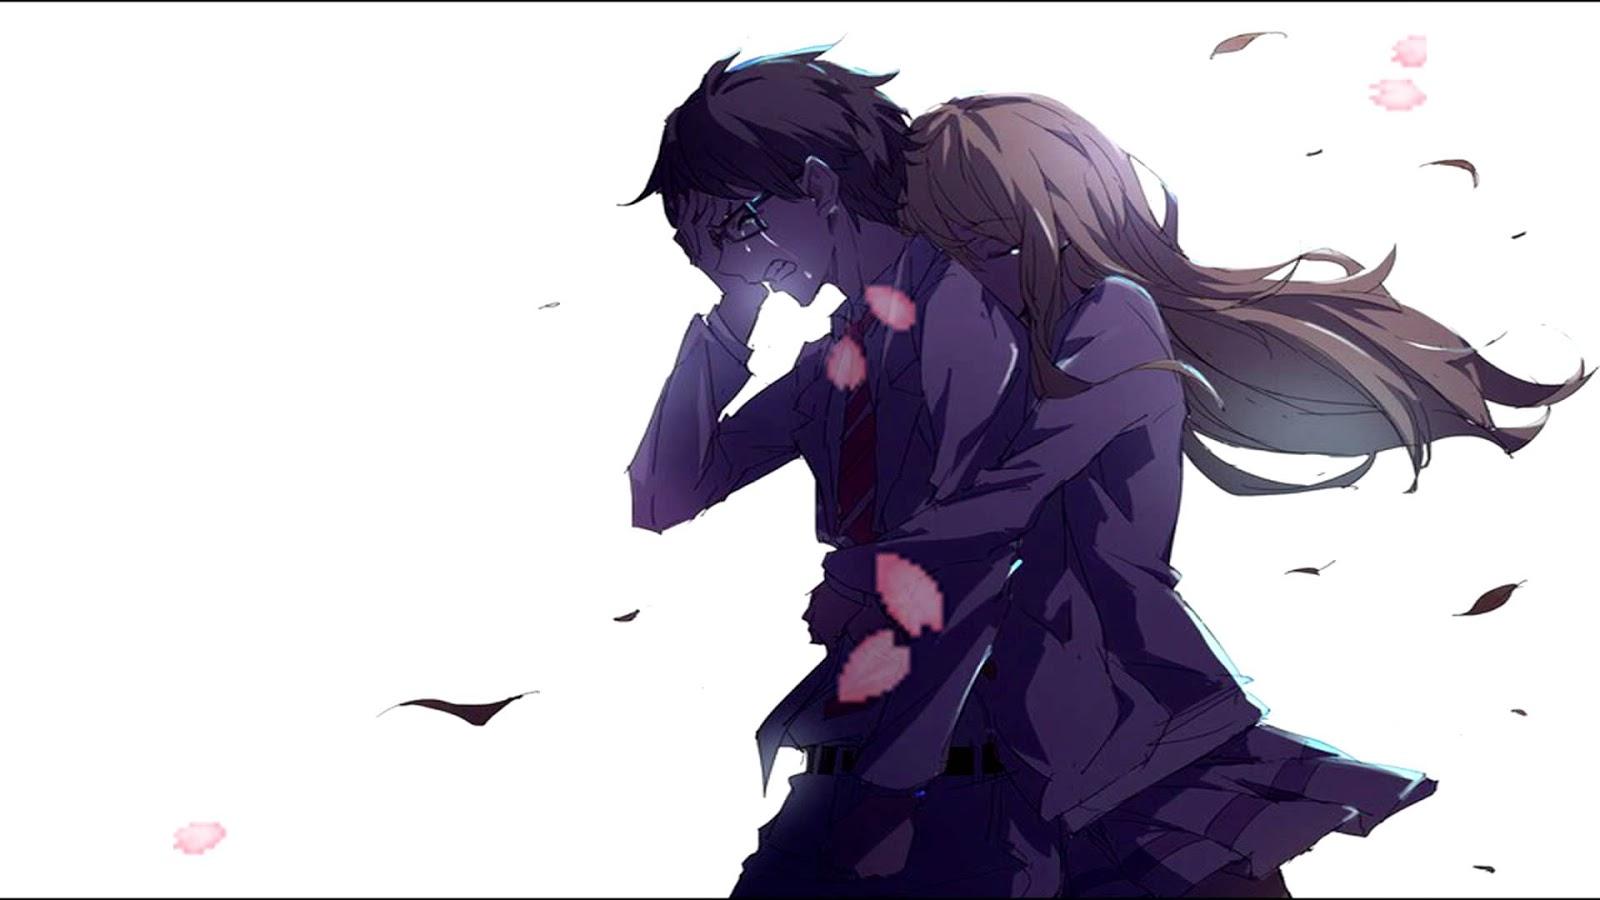 78 Gambar Anime Keren Dan Romantis Paling Bagus Gambar Pixabay